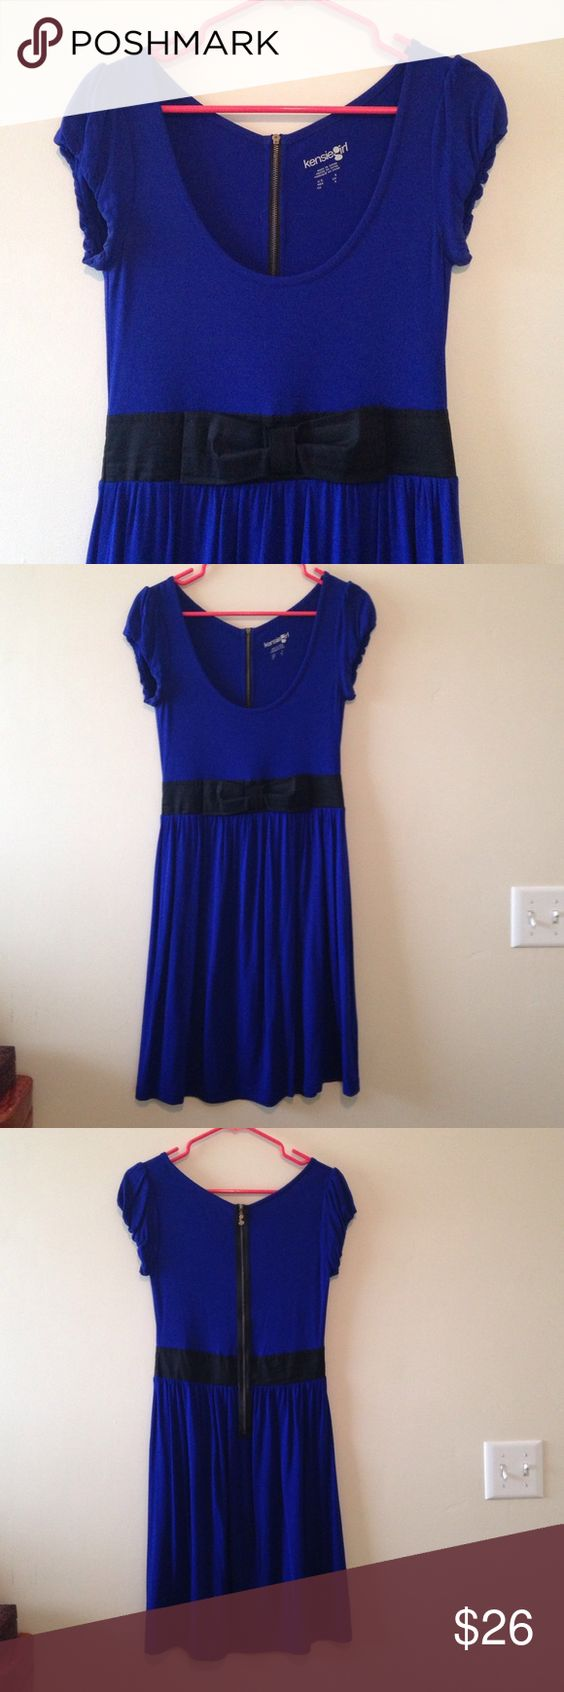 Royal Blue Dress with Black Bow waist